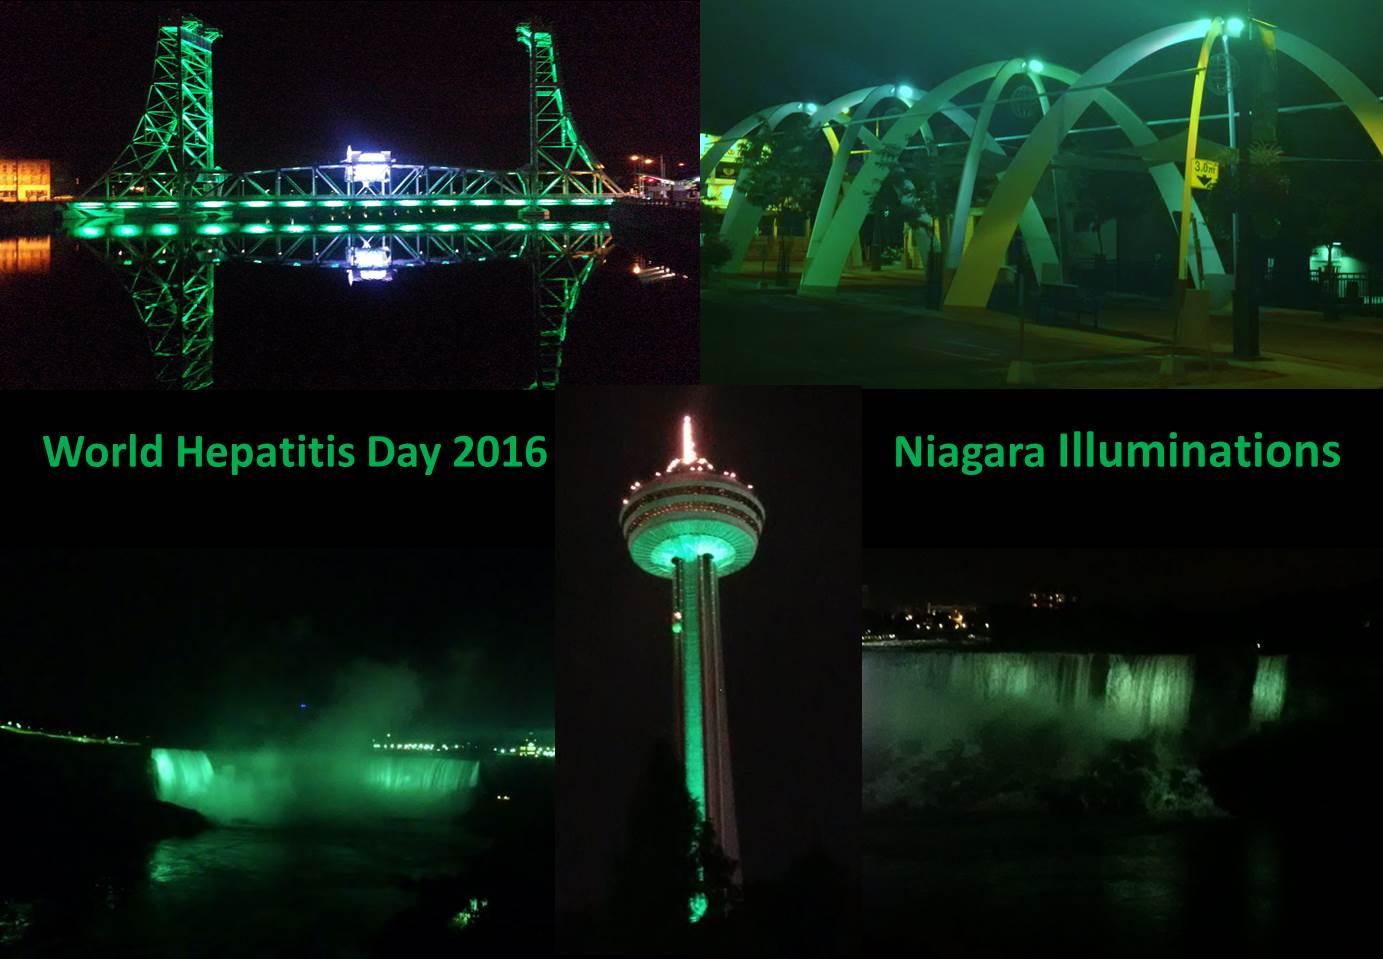 www.niagarahealth.on.ca/services/hepatitis-c-care